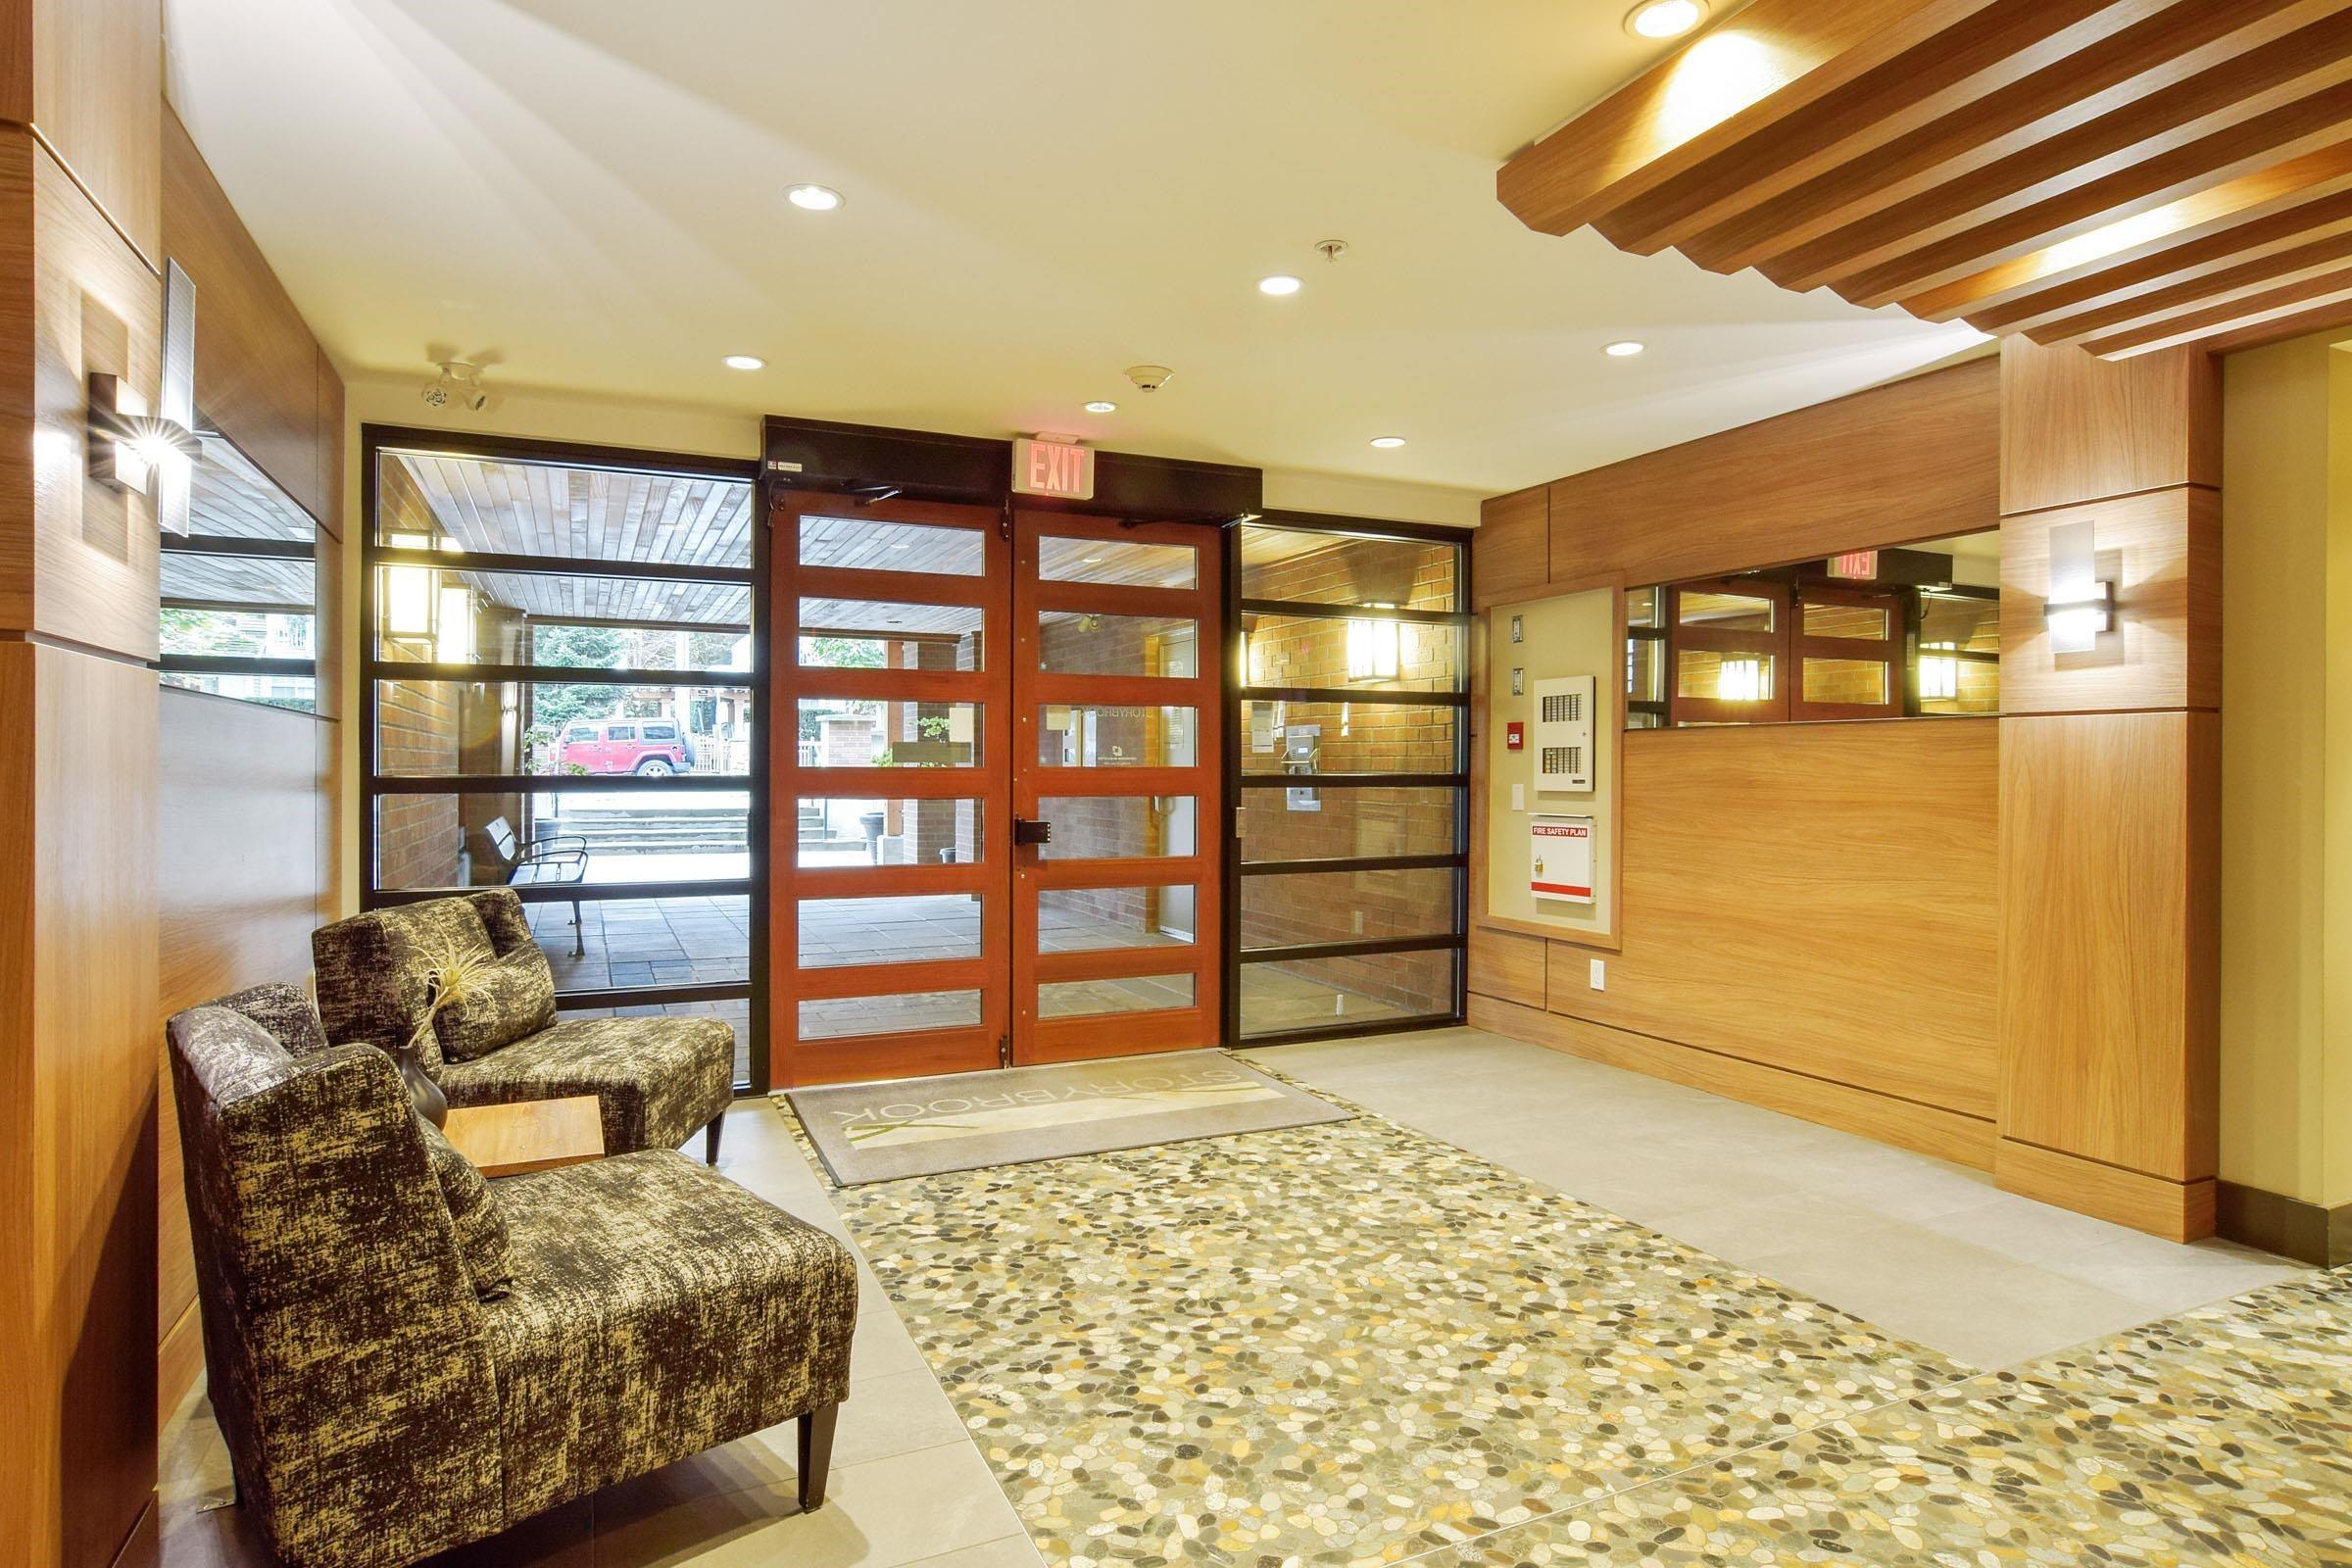 301 7131 STRIDE AVENUE - Edmonds BE Apartment/Condo for sale, 1 Bedroom (R2625669) - #20